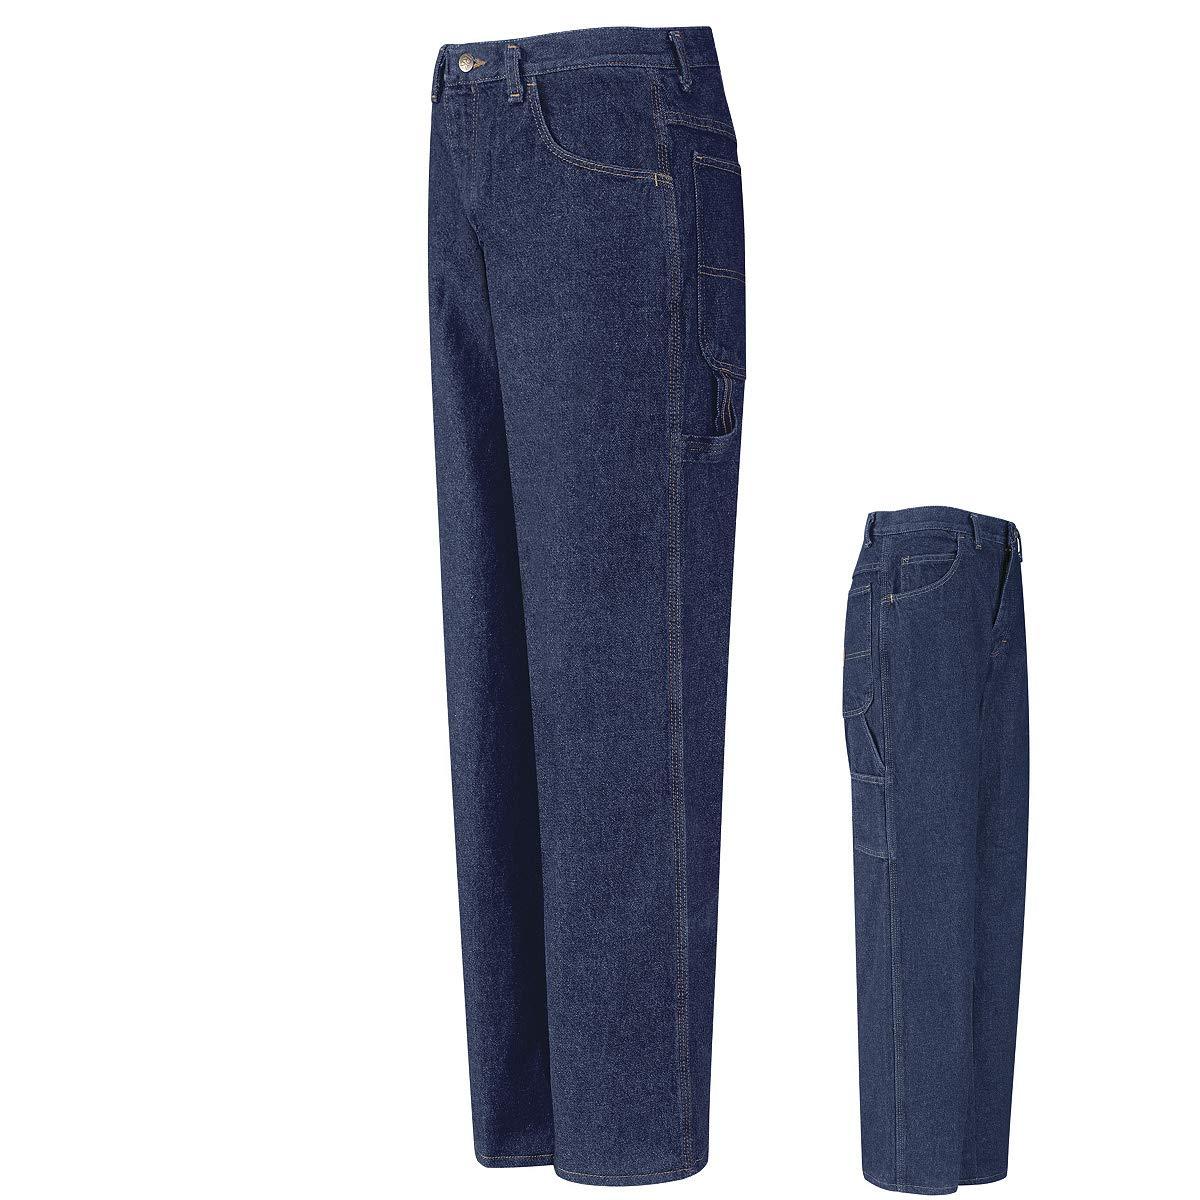 Red Kap Size 32 X 32 Prewashed Indigo Cotton Dungarees With Zipper Closure